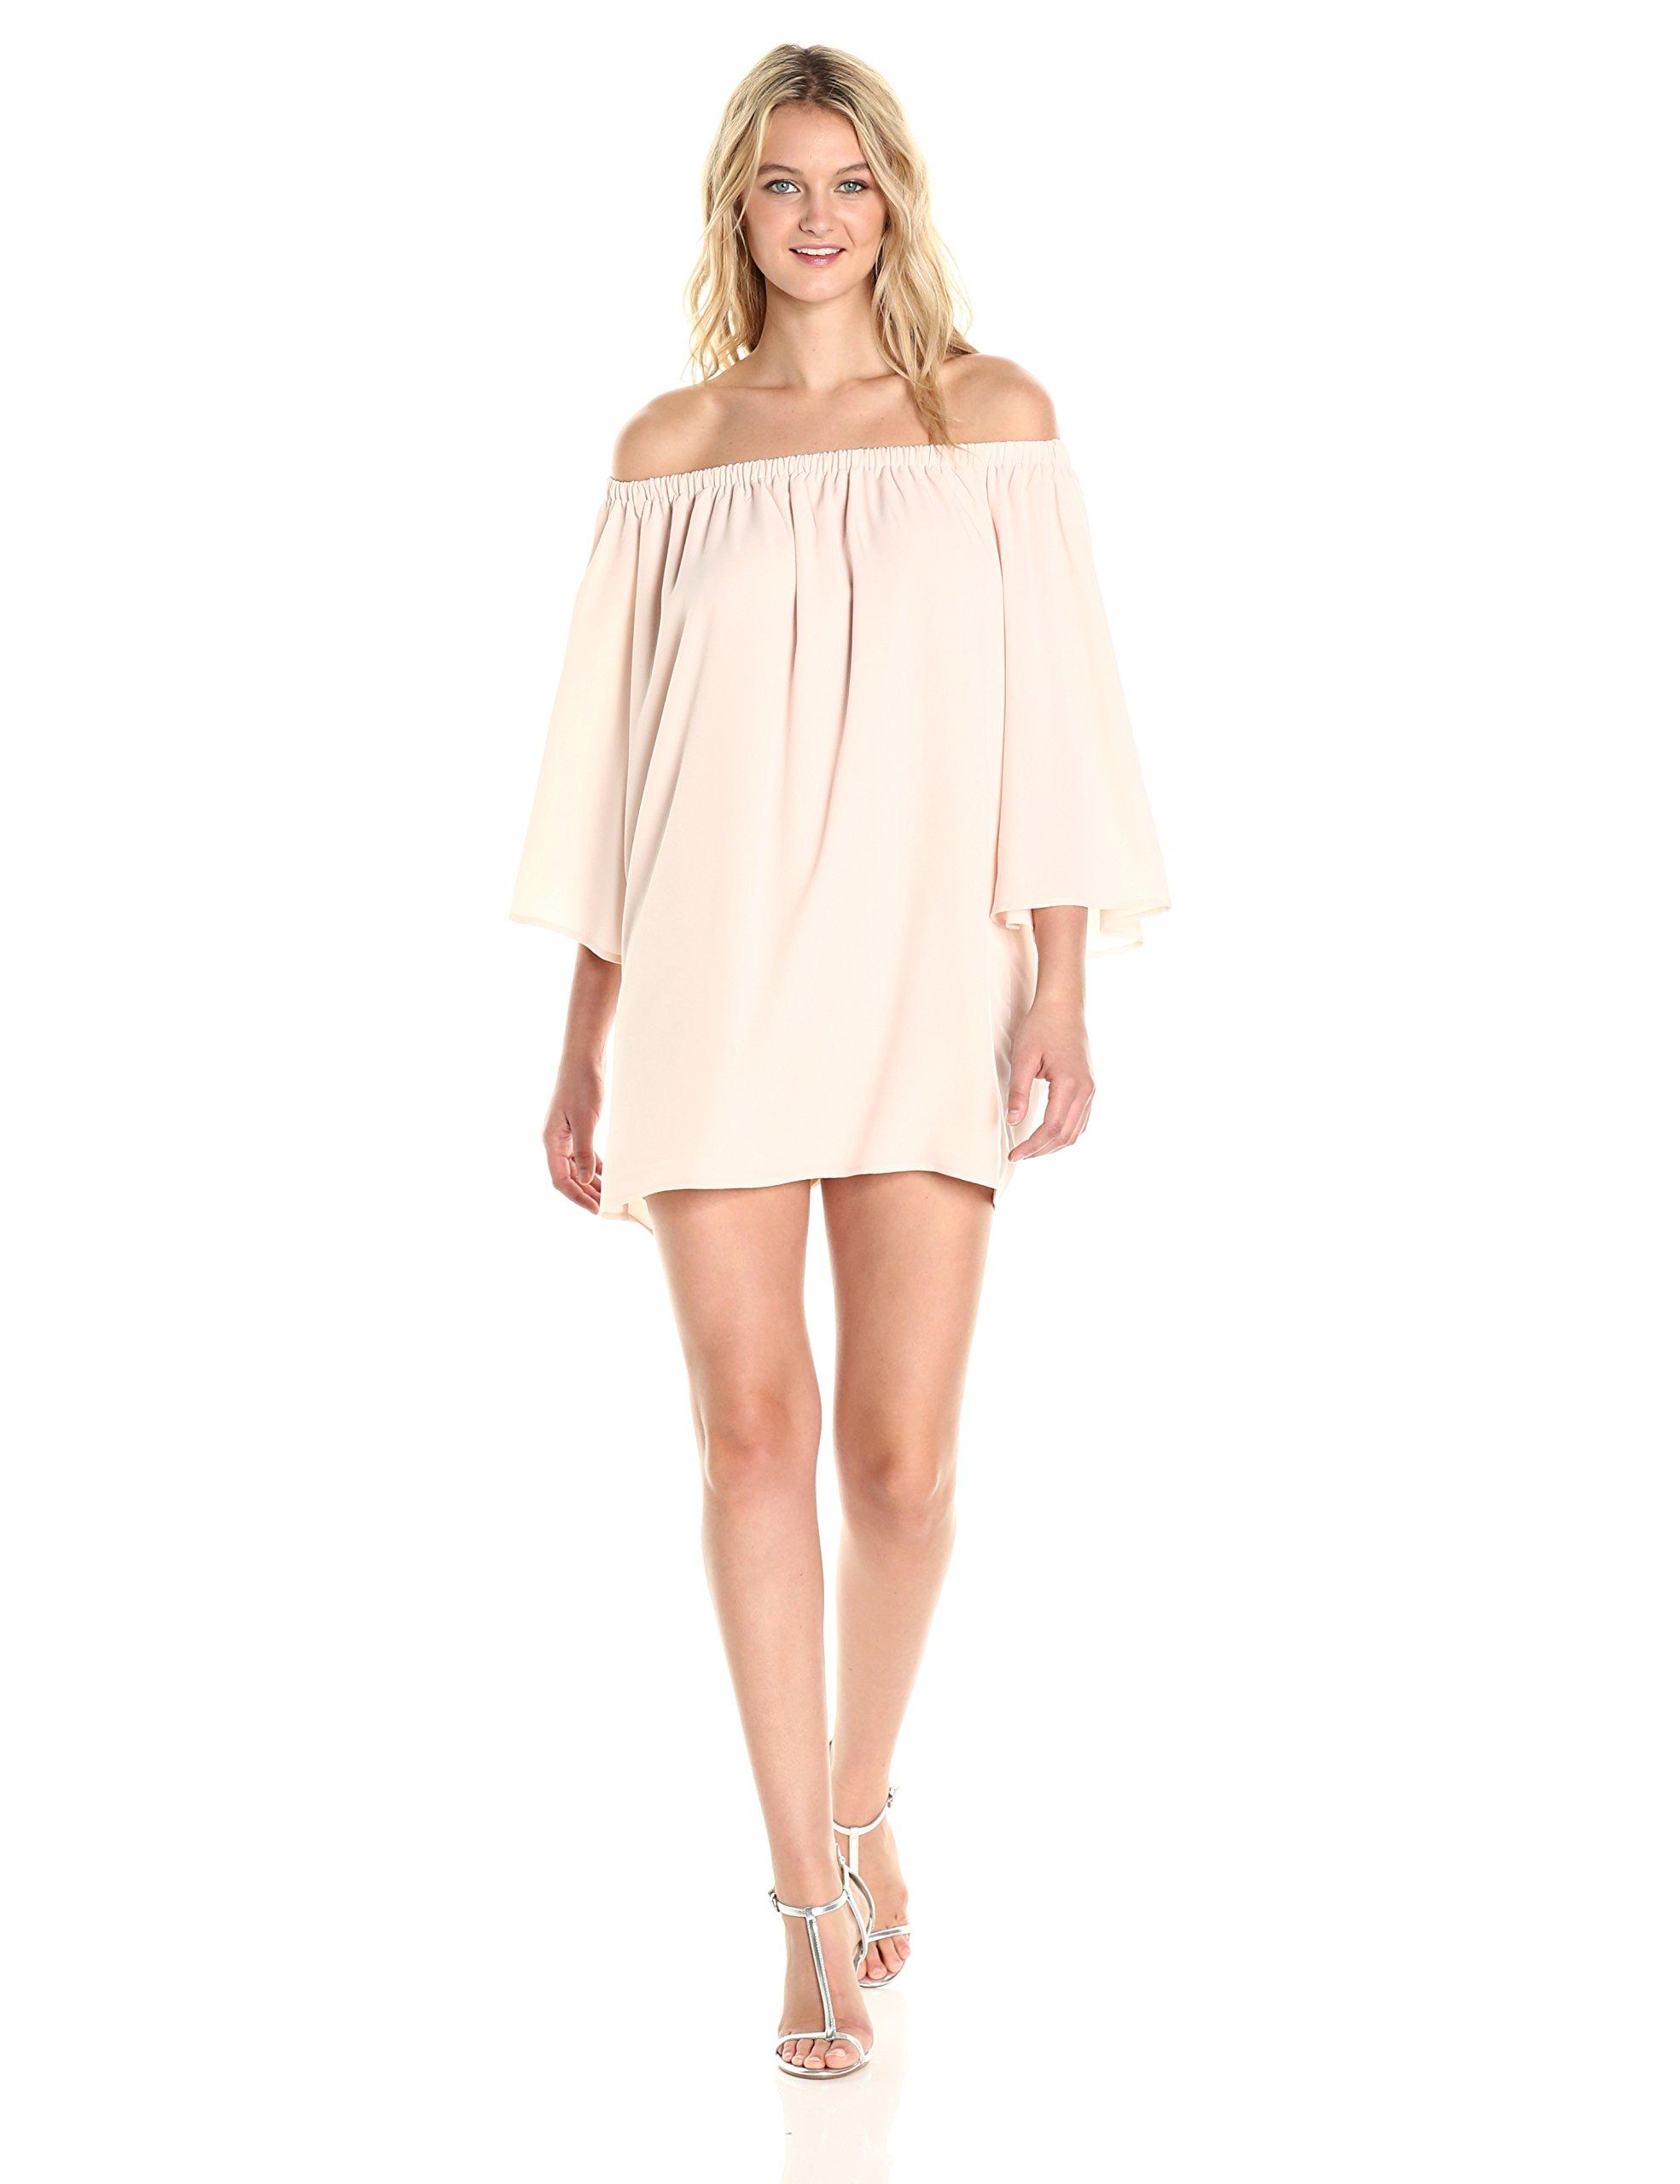 French Connection Women's Summer Crepe Light OTS Dress, Capri Blush, M